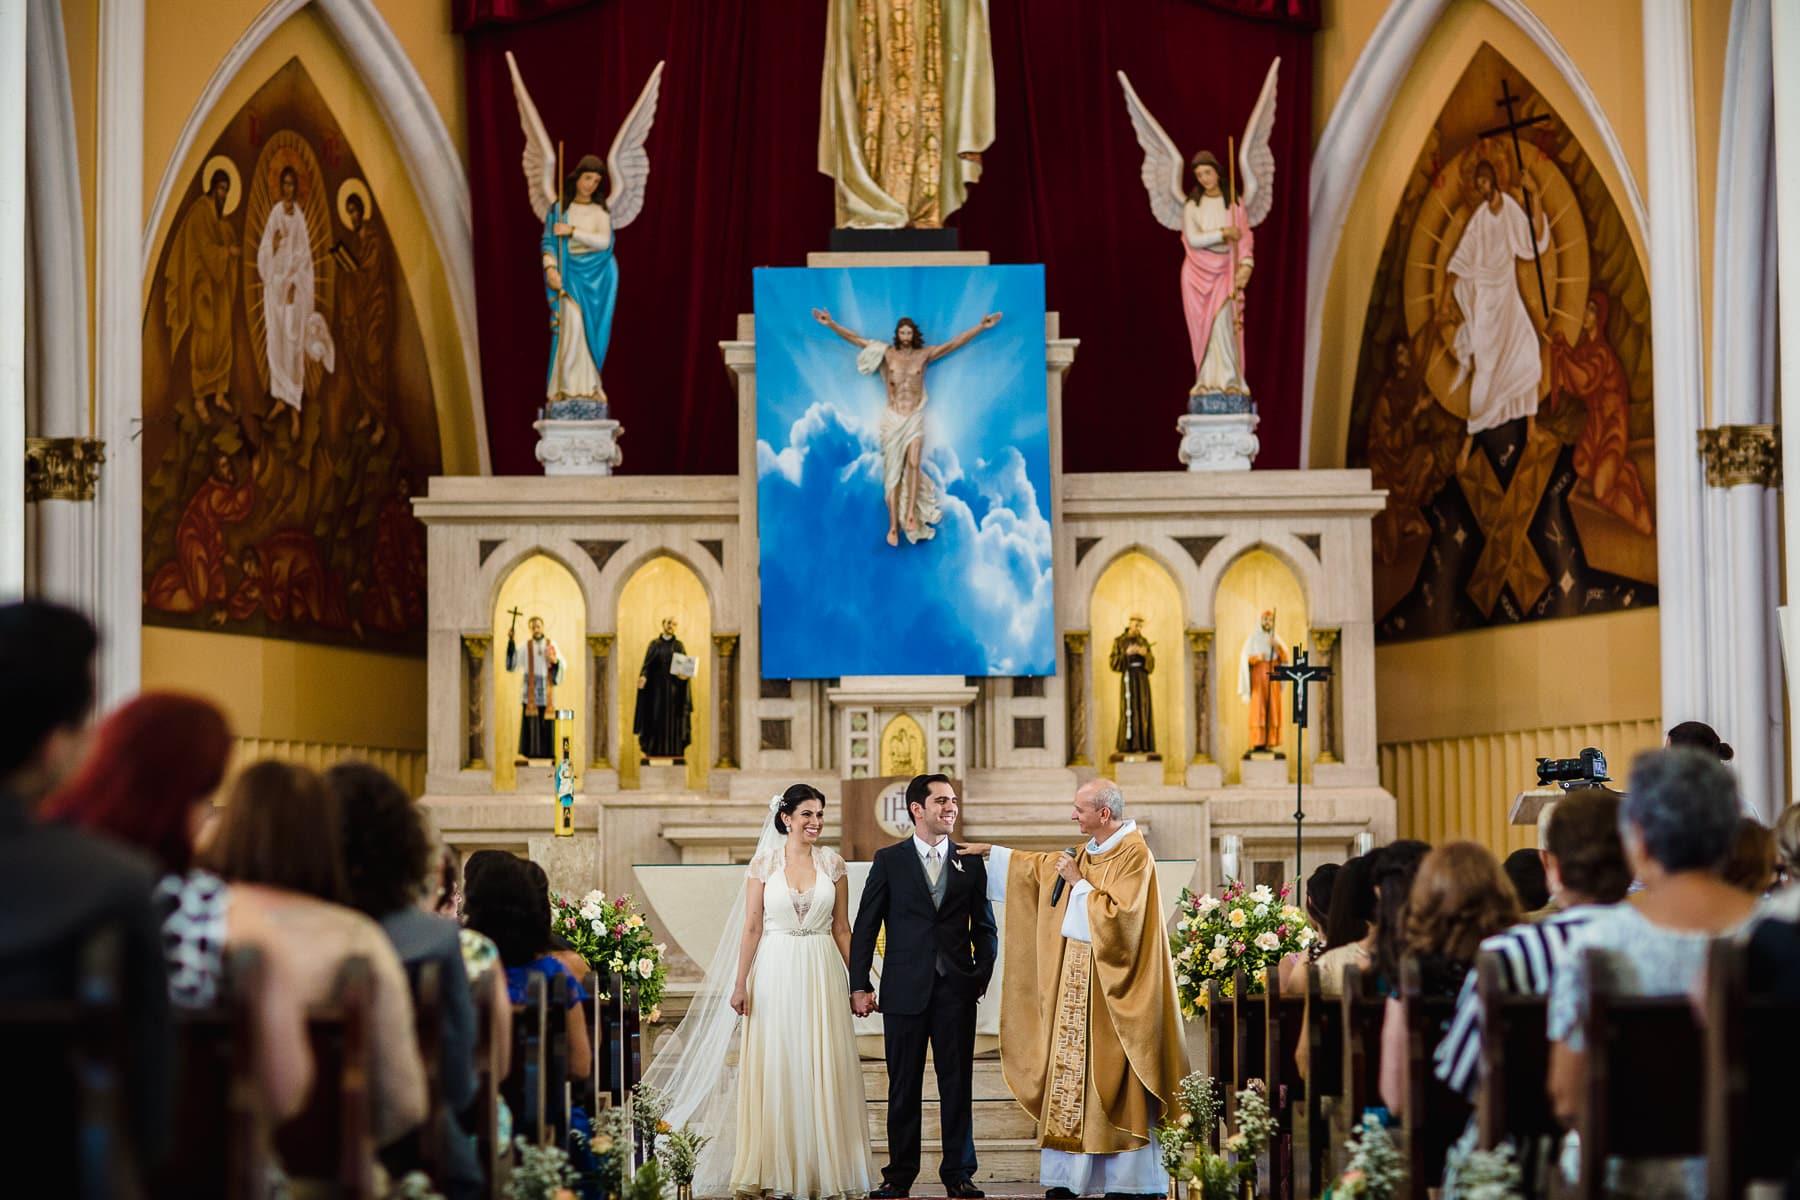 casamento-igreja-do-cristo-rei-fortaleza-37